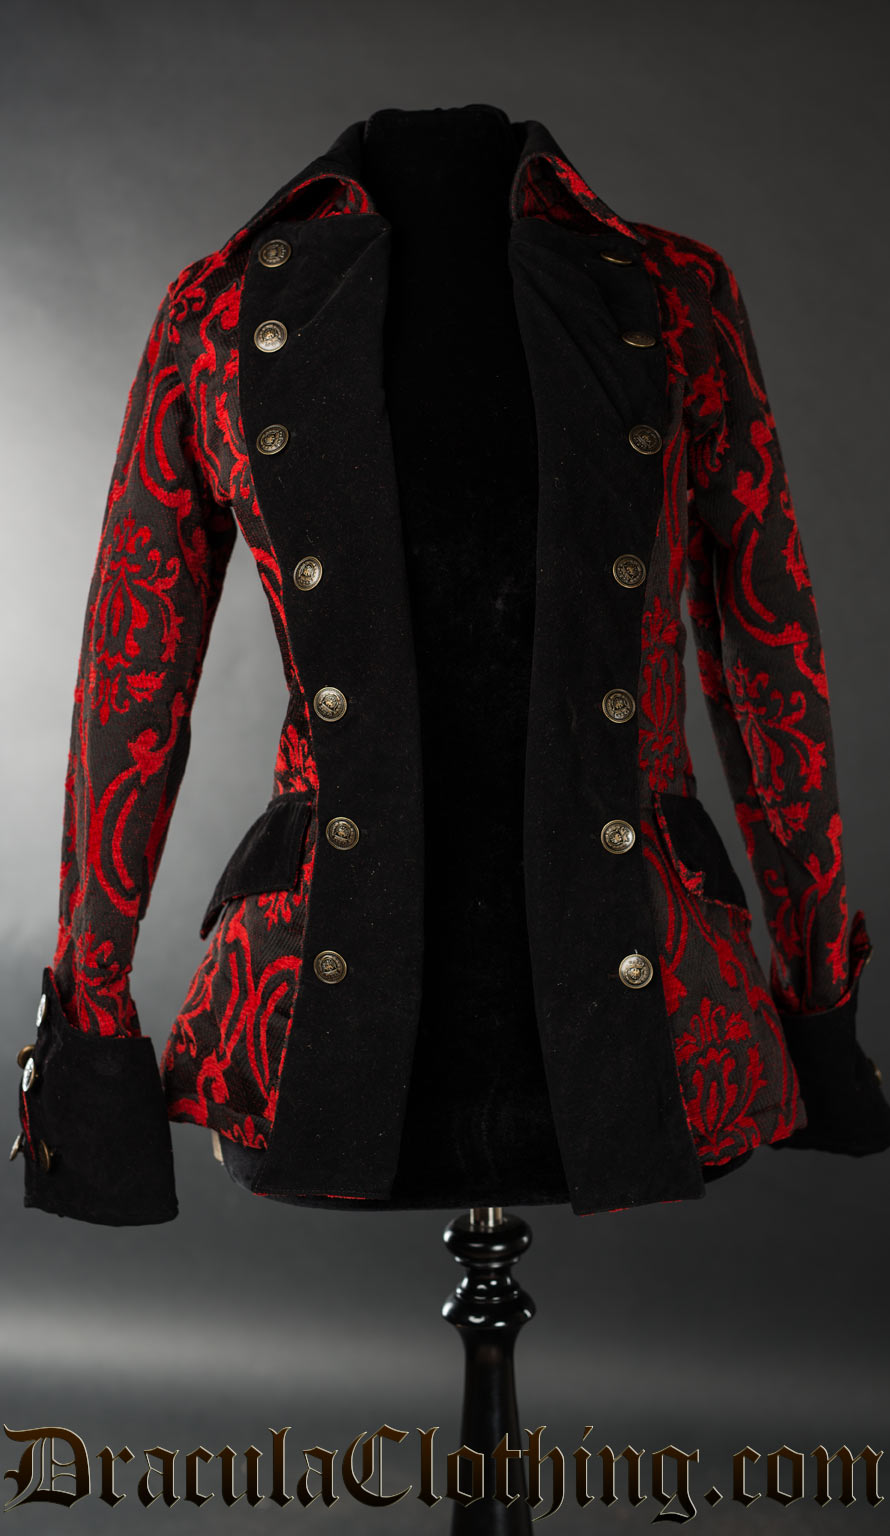 Red Brocade Female Pirate Jacket